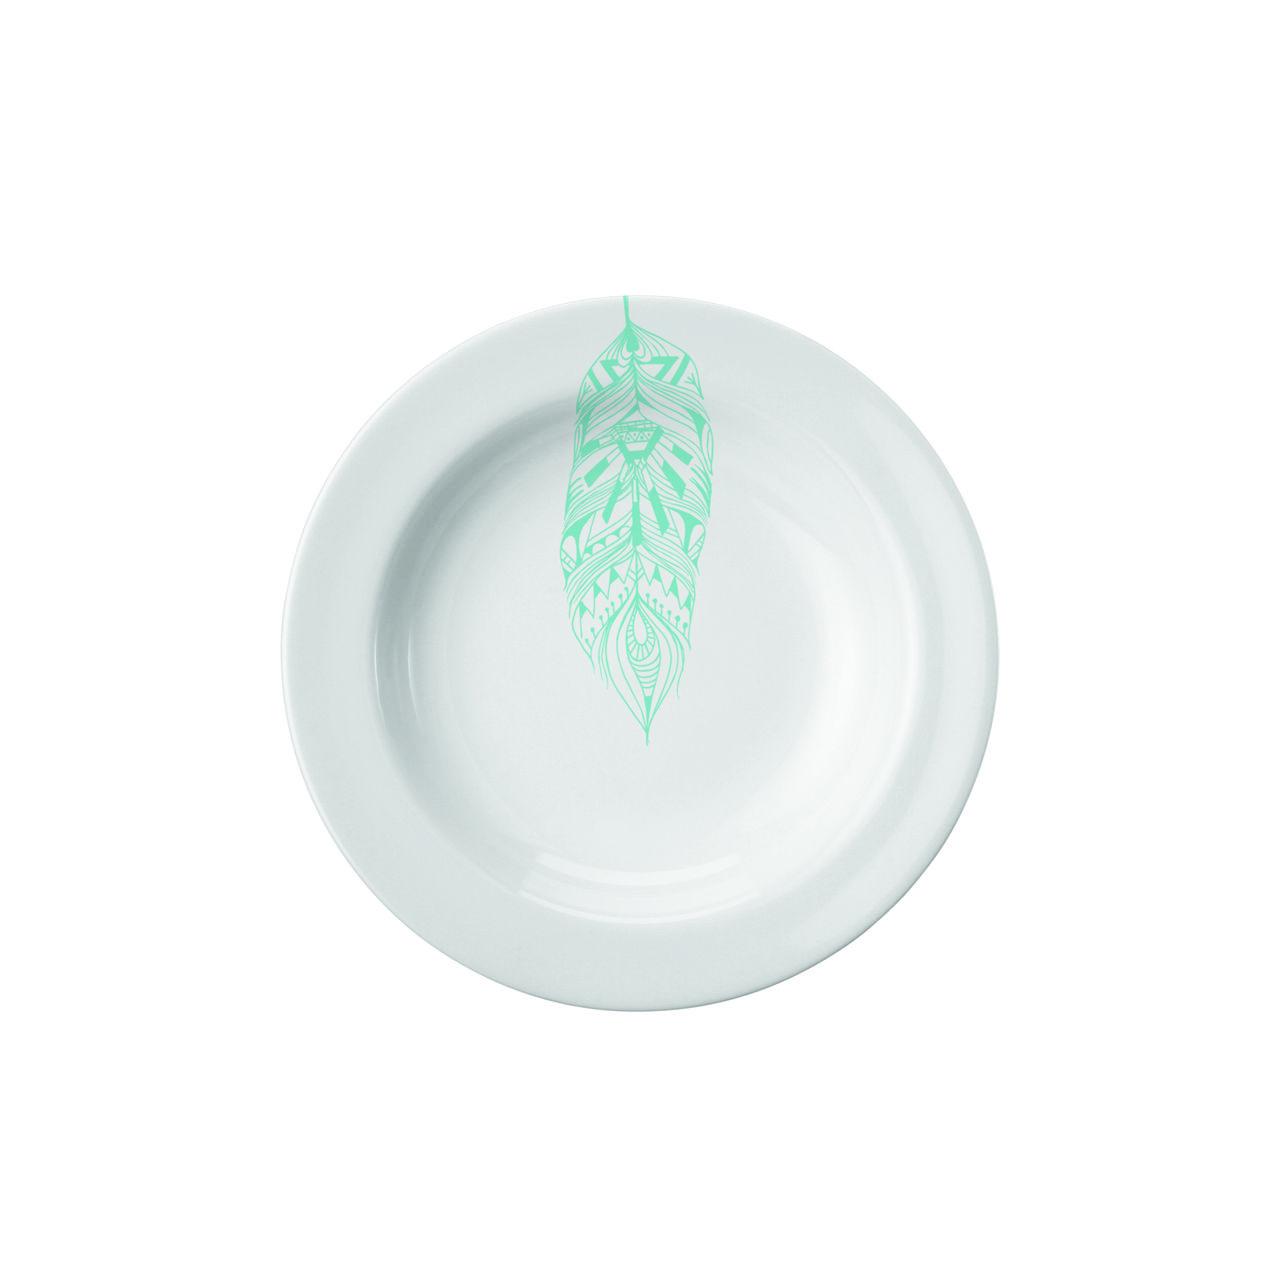 Aparelho de Jantar 20 Peças Casual Collection - Damma Schmidt